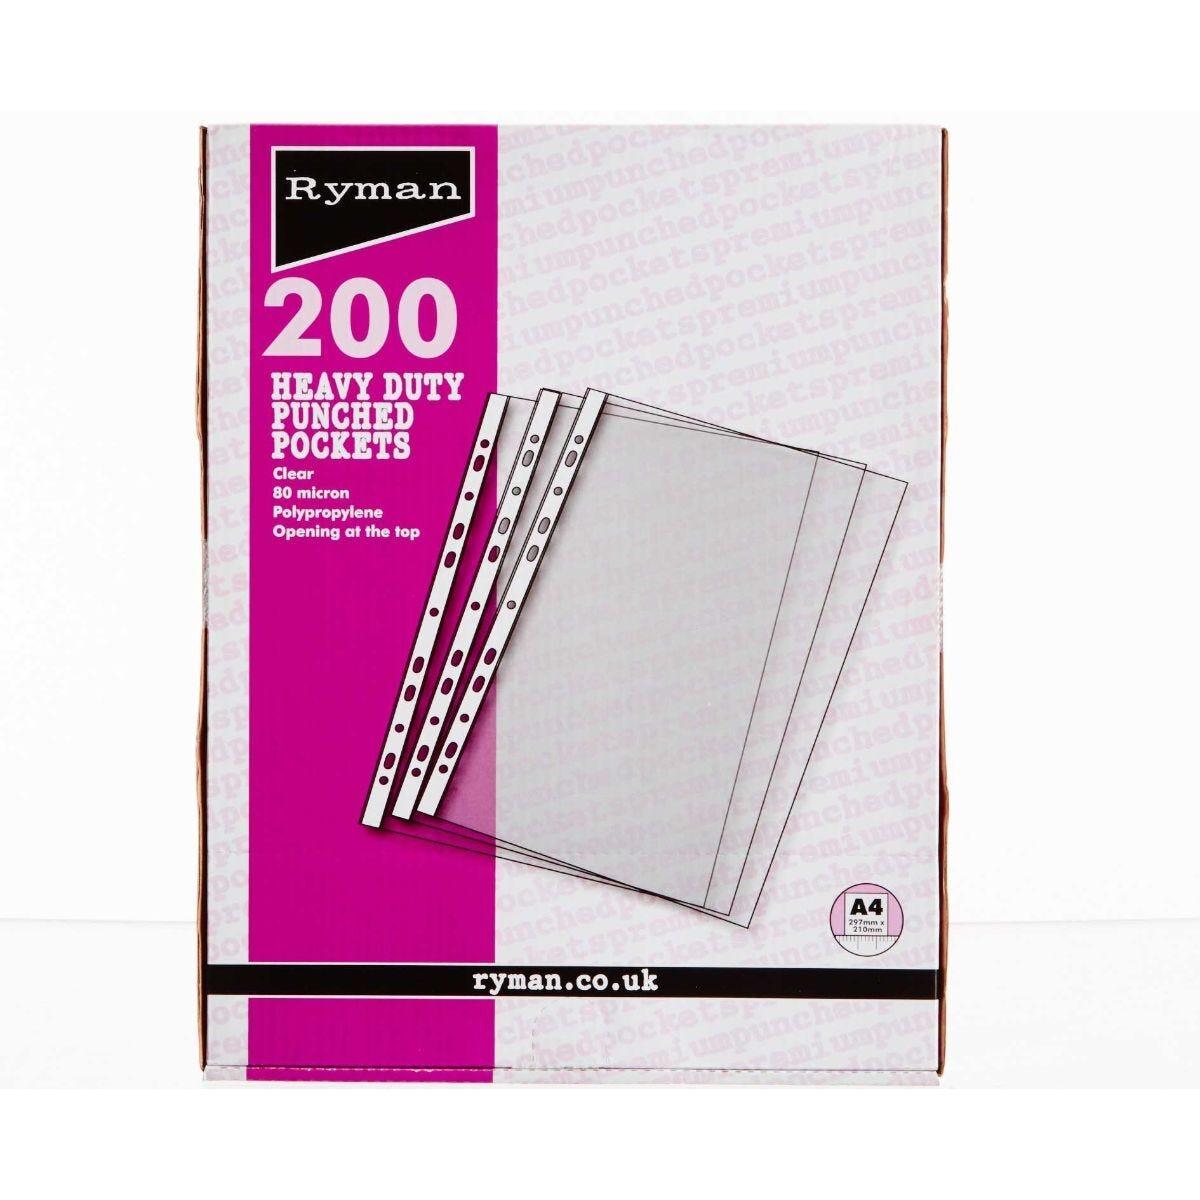 Ryman Premium Pockets Pack of 200 A4 80 Micron Clear